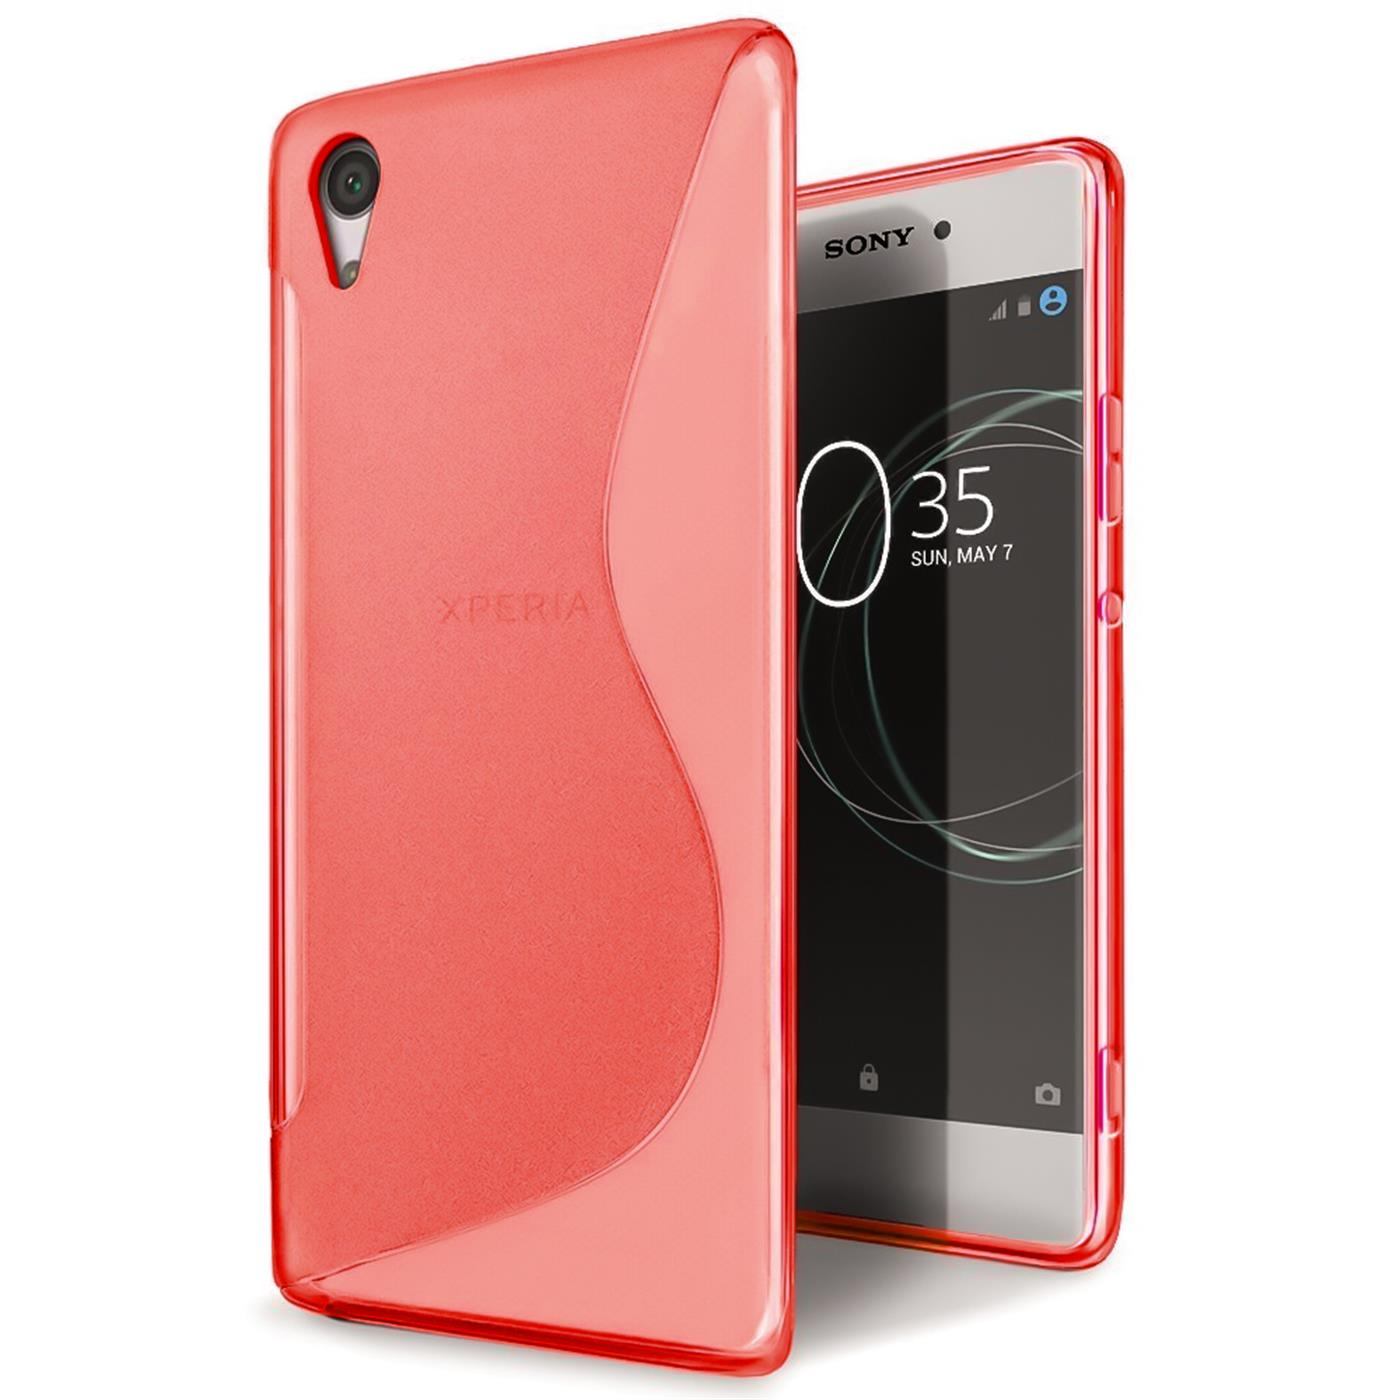 Handy-Huelle-fuer-Sony-Xperia-E5-TPU-Slim-Case-Silikon-Cover-Schutz-Tasche-Rot